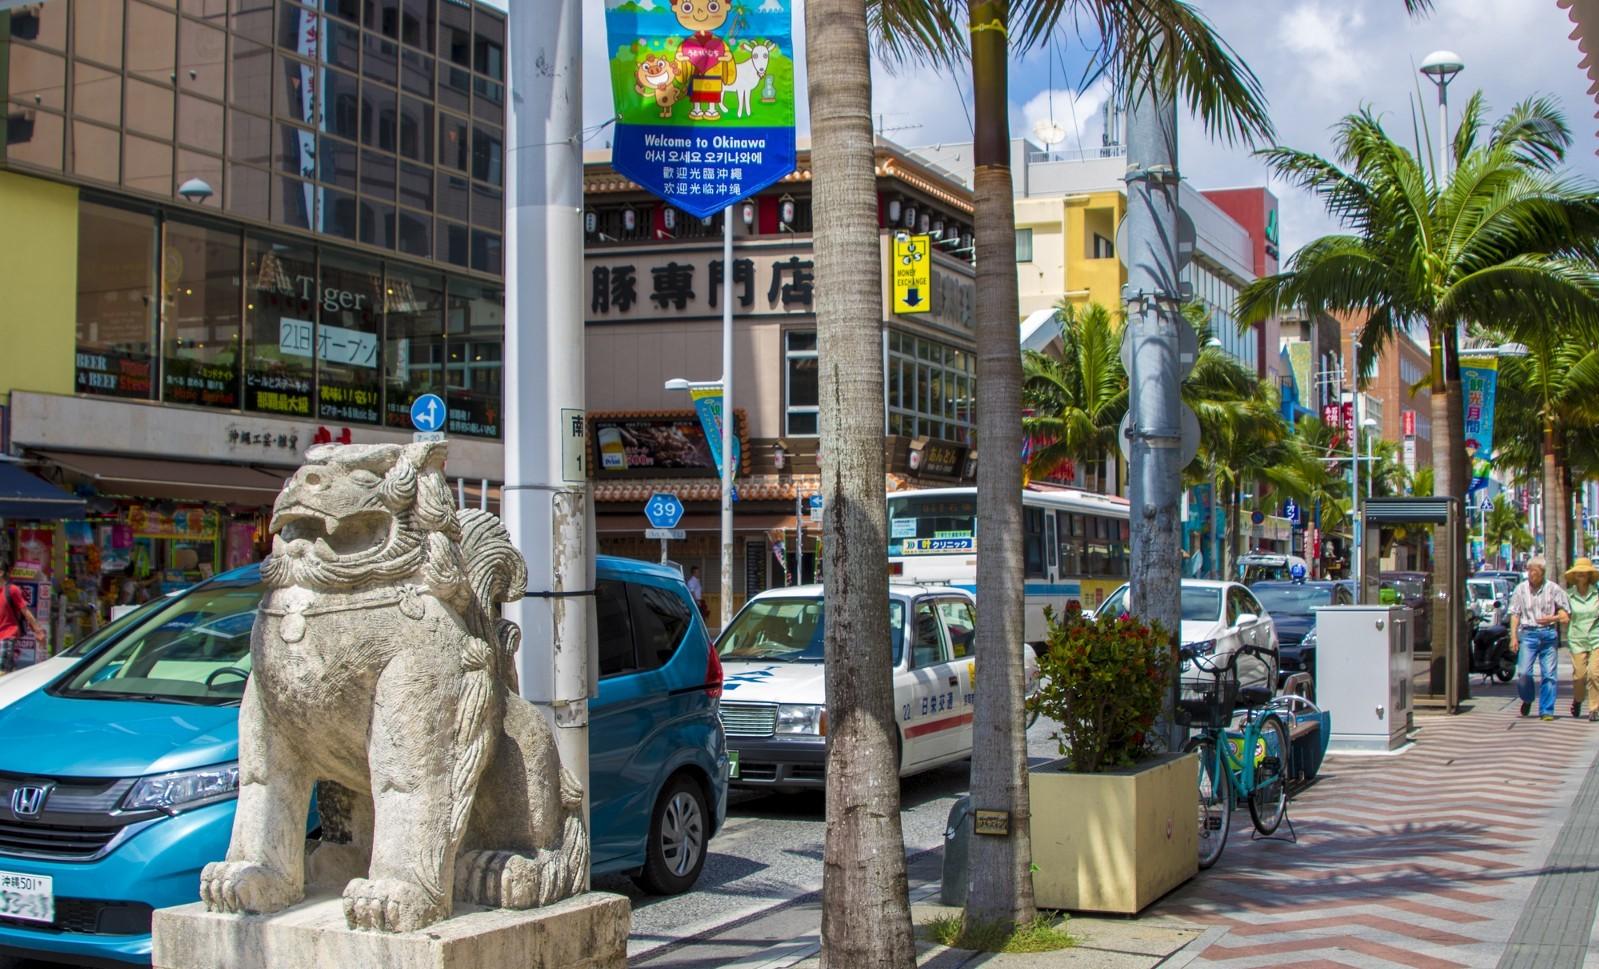 The bustling street of Kokusai Dori in Okinawa